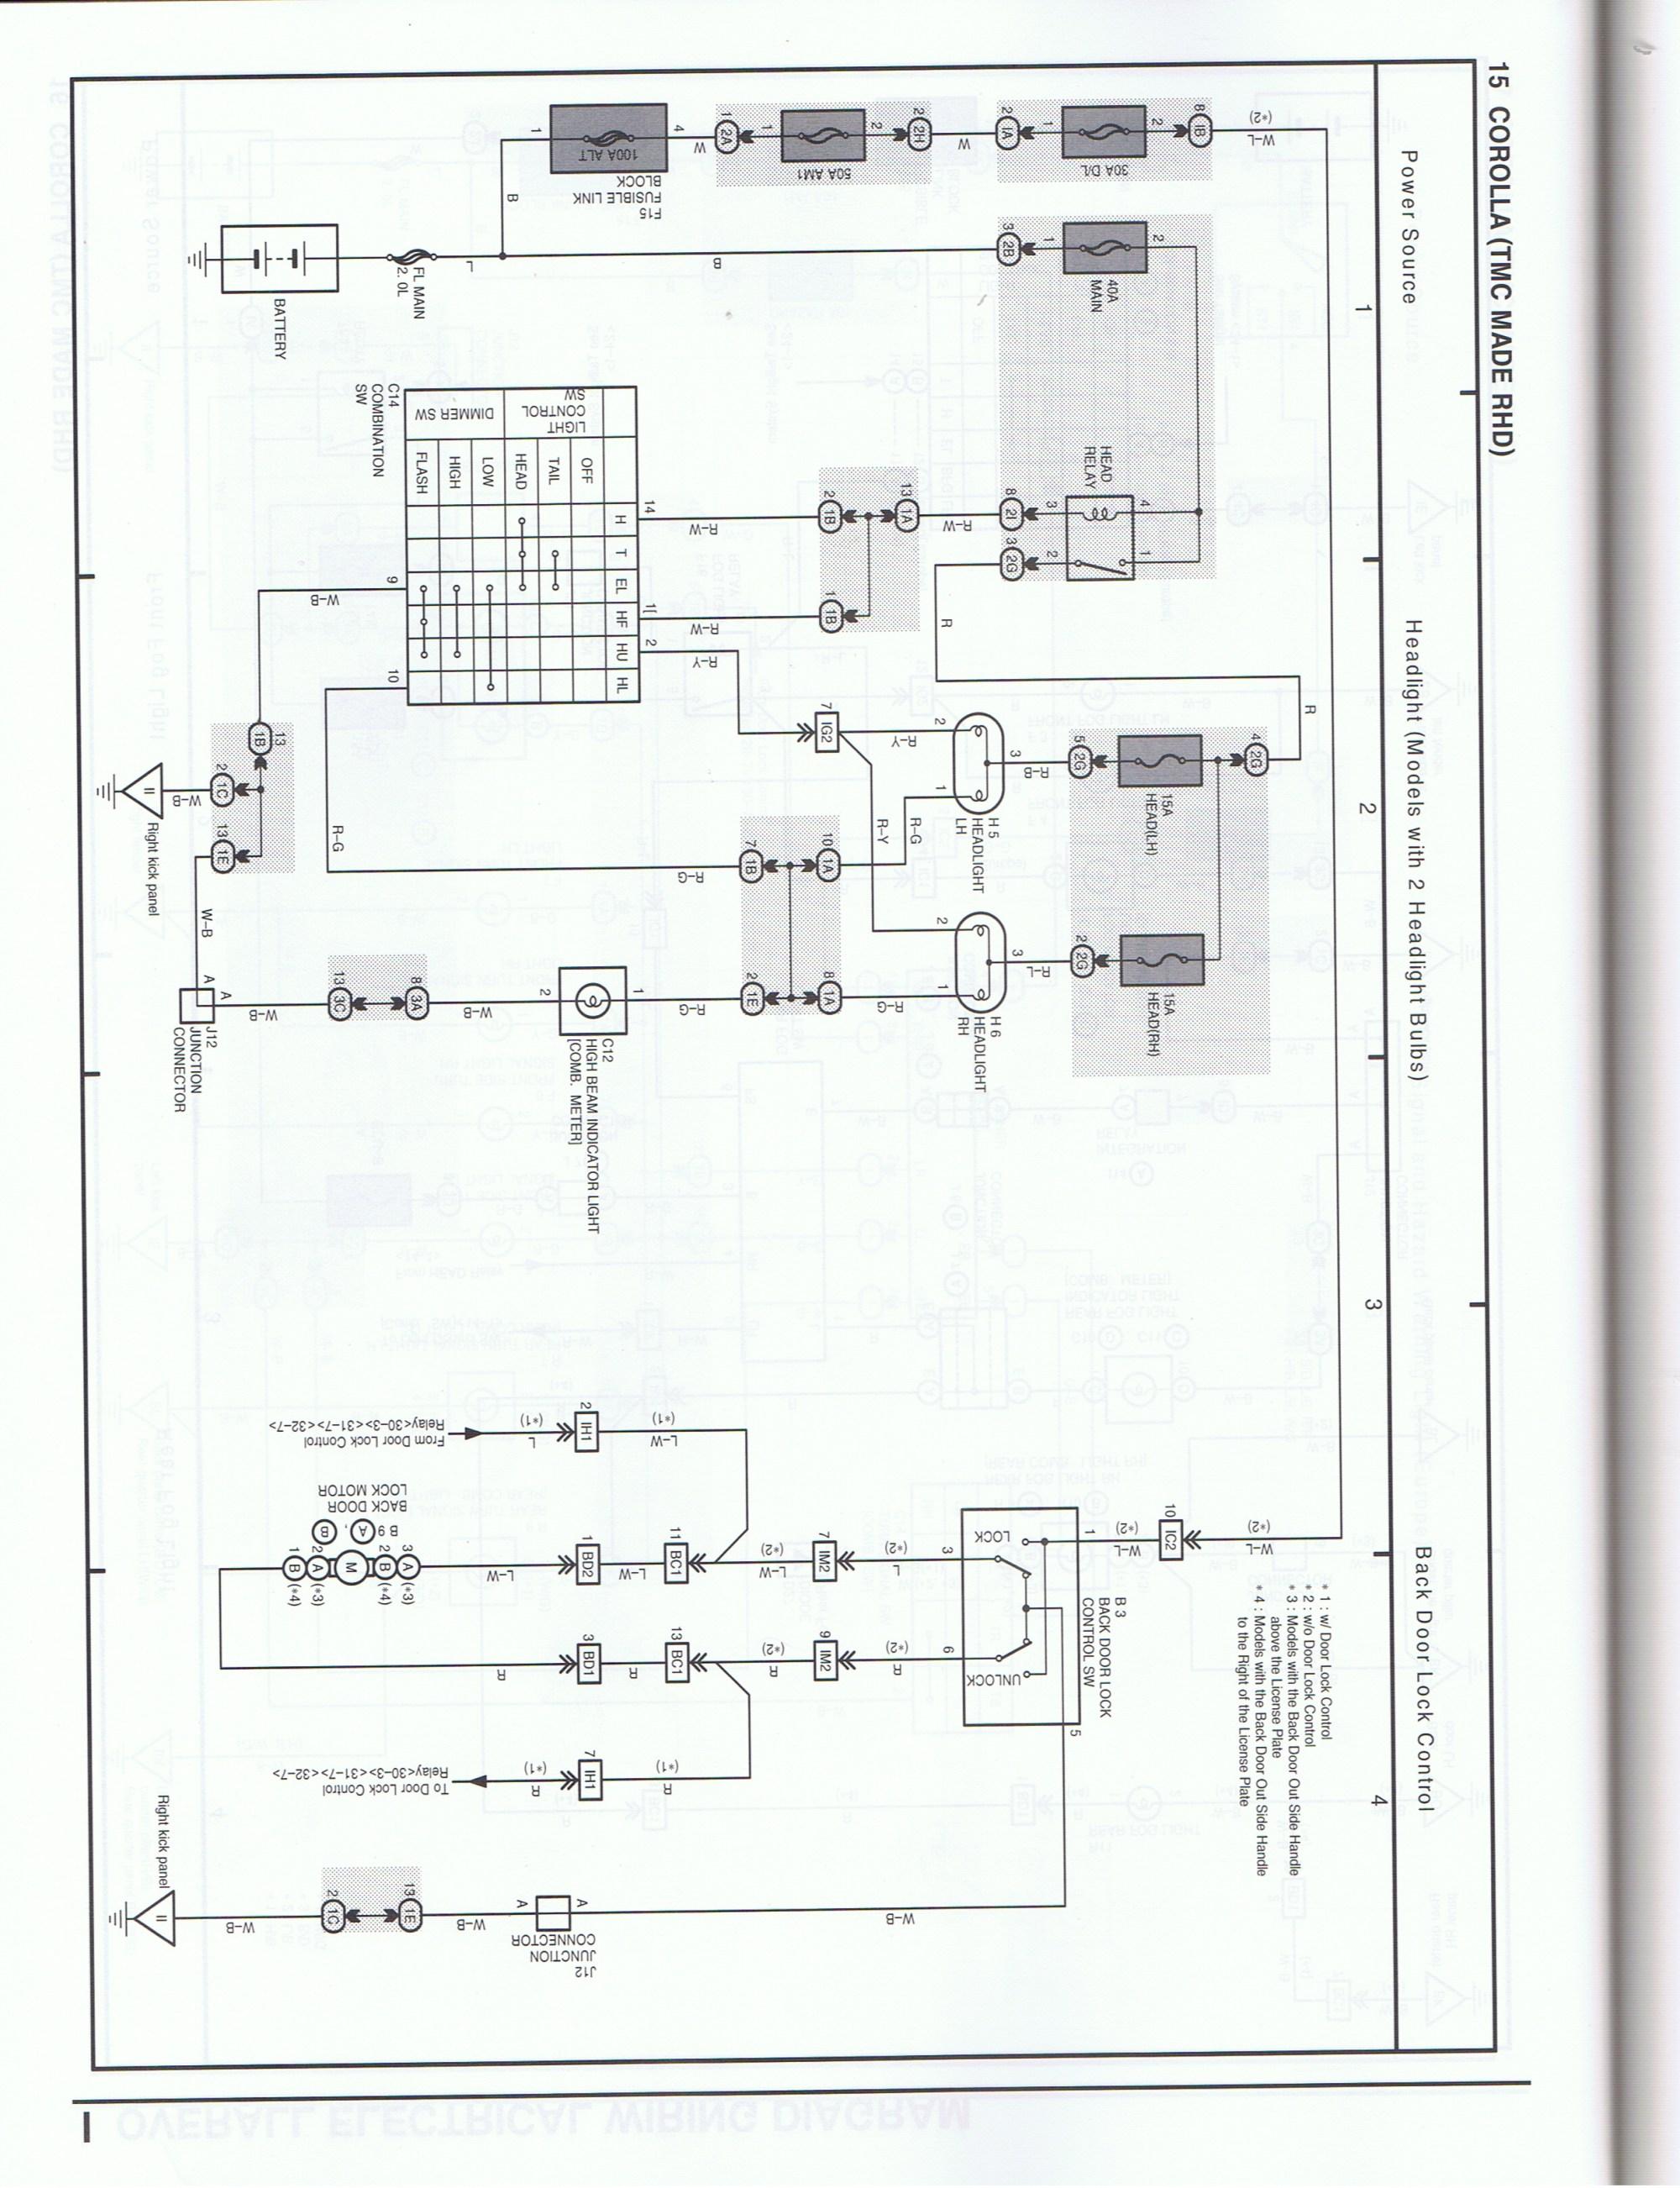 hight resolution of acura rsx o2 sensor wiring diagram nerv rh yunerv blogspot com 2004 acura rsx sensor diagram 2003 acura rsx sensor diagram